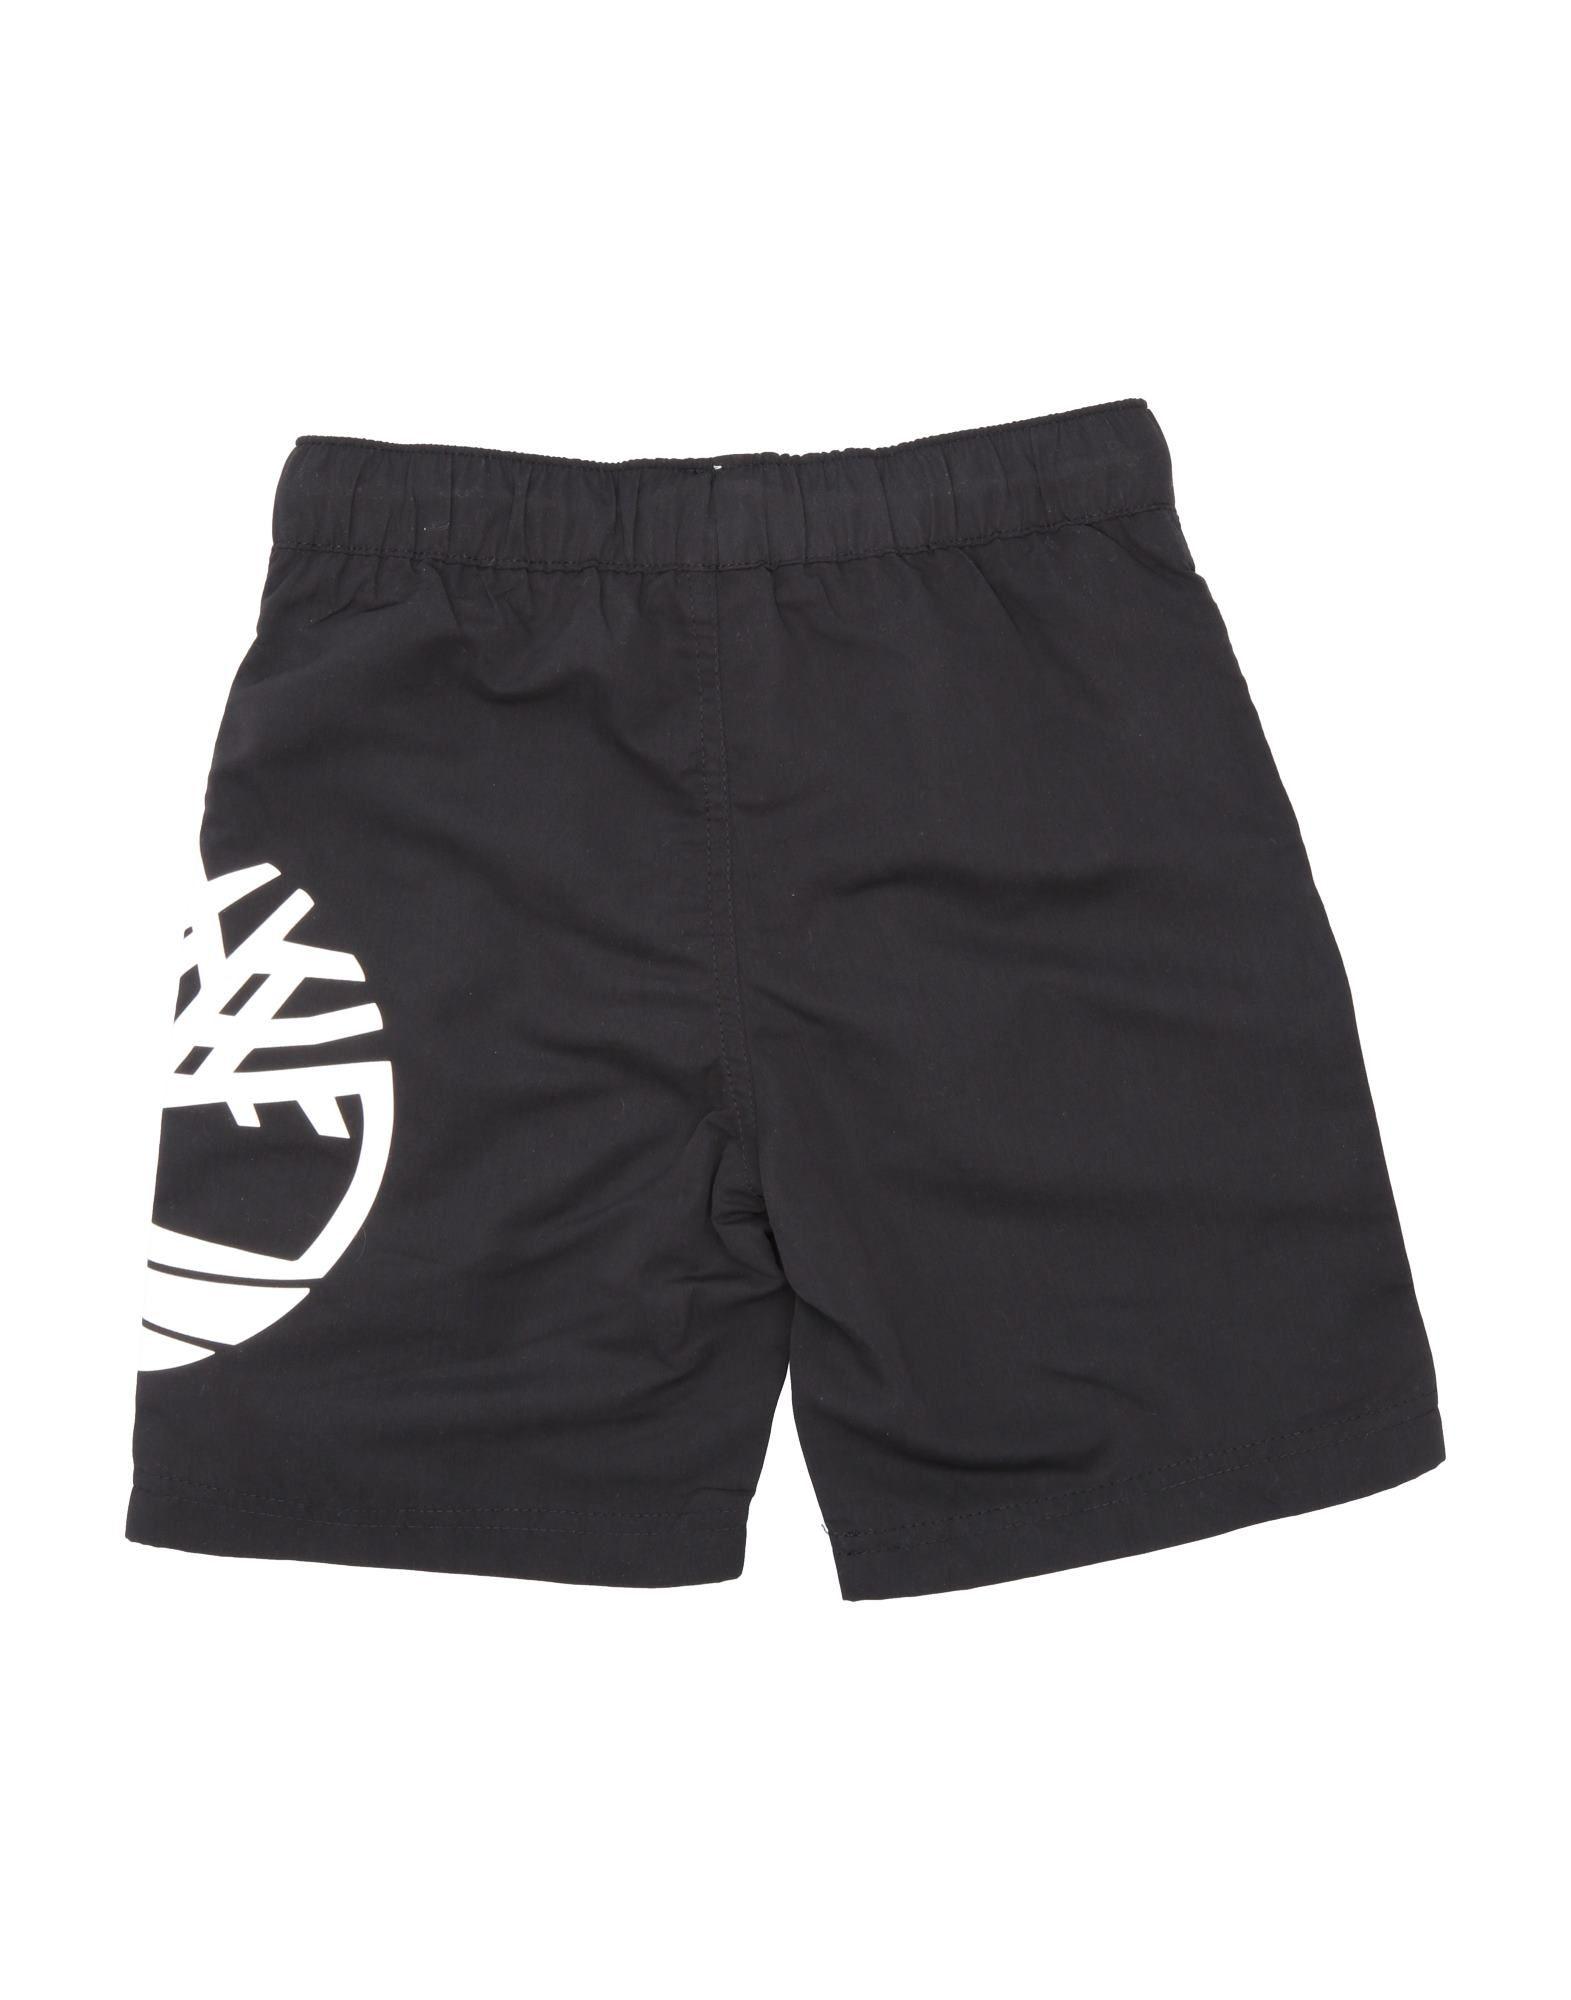 Timberland - Swimwear - Swimming Trunks - On Yoox.com